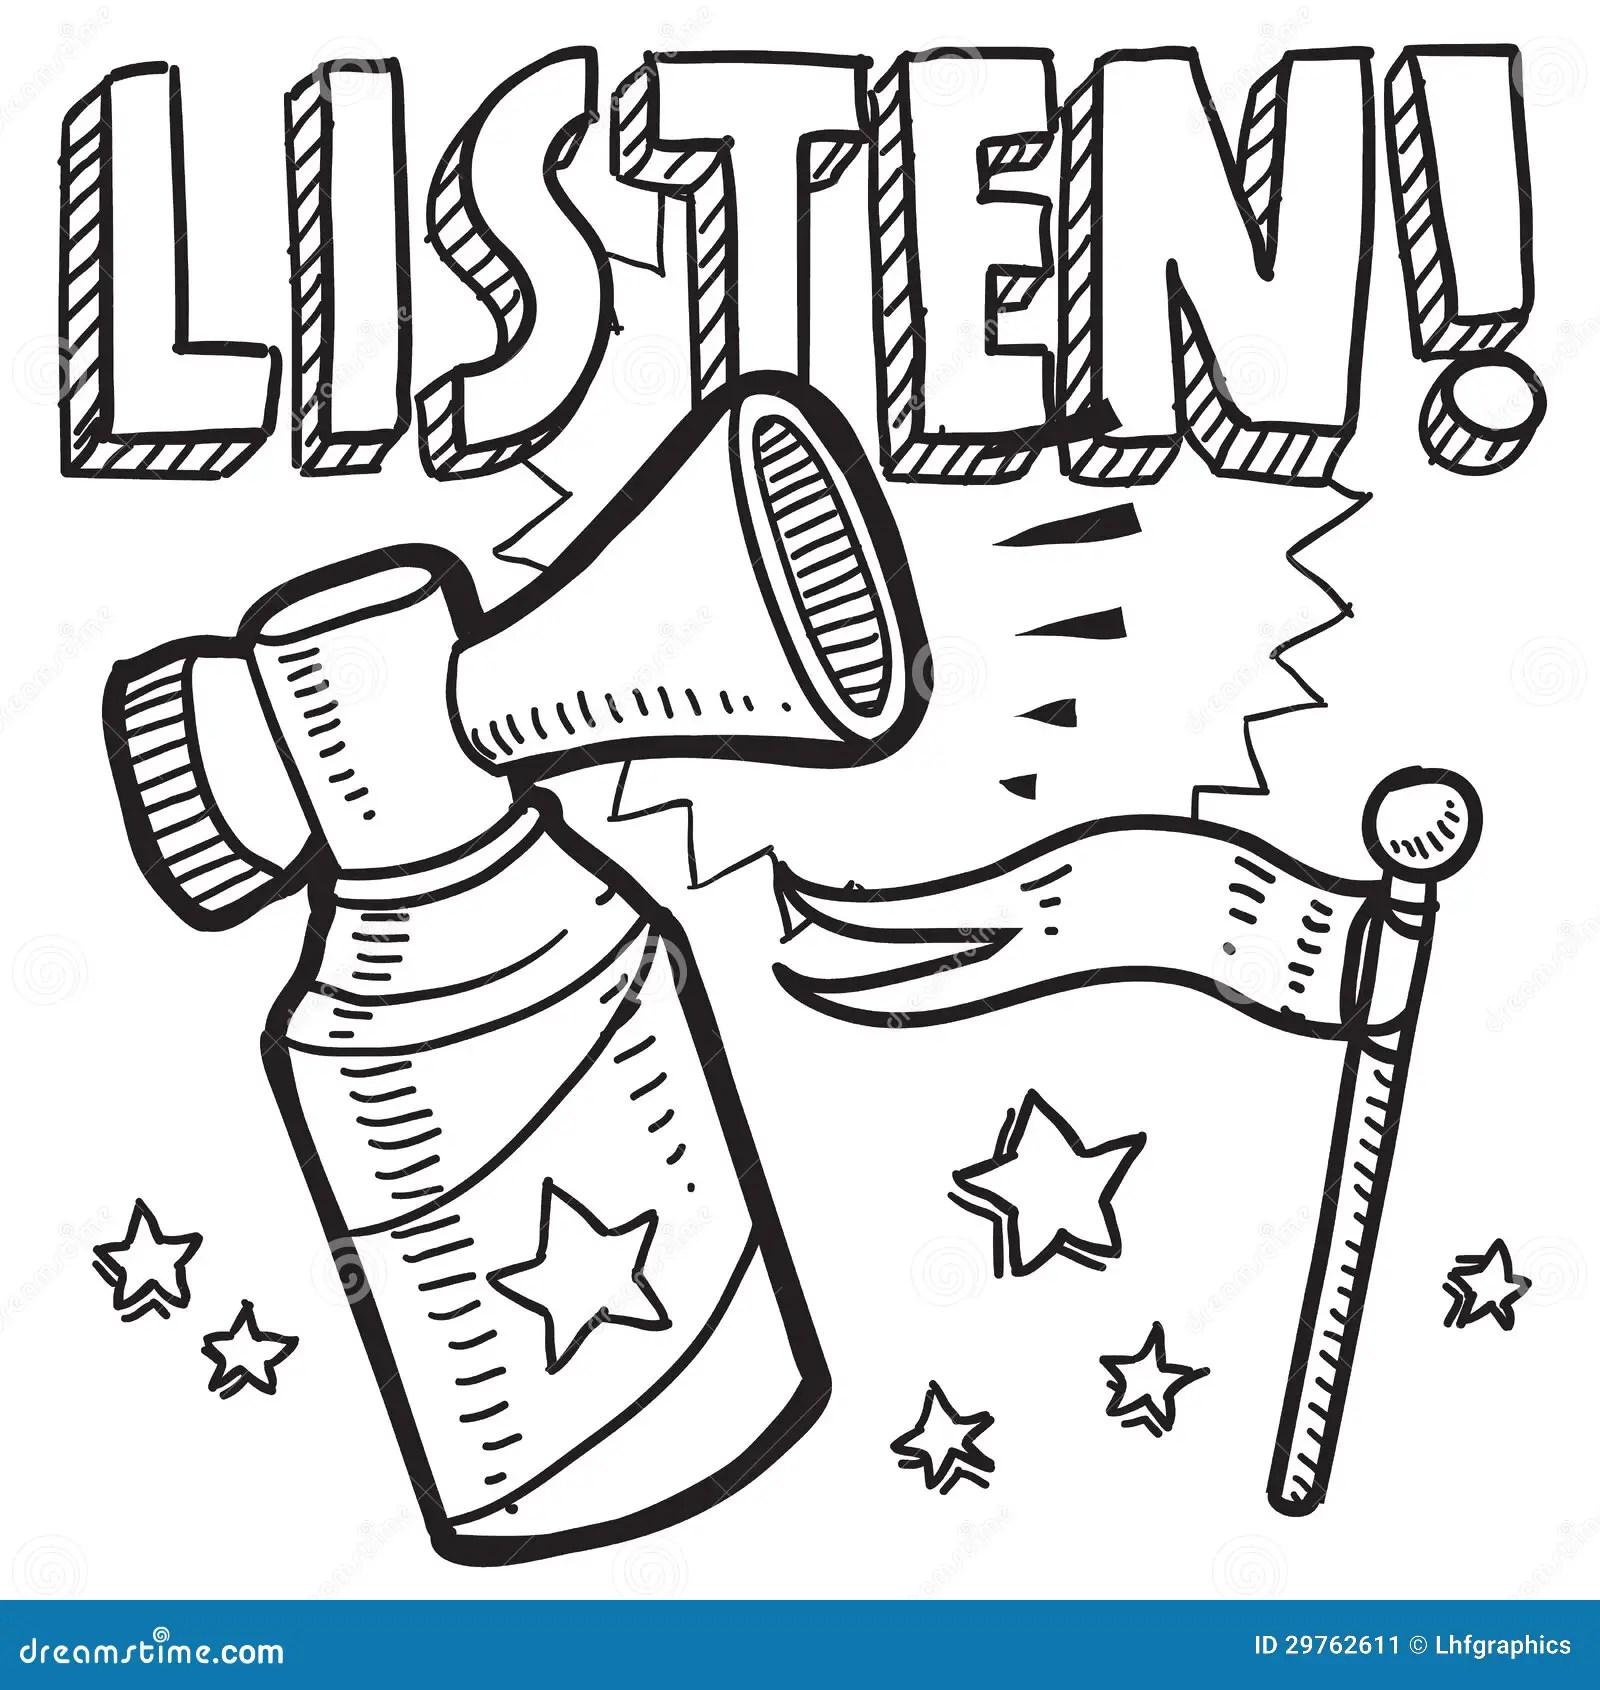 Listen Announcement Sketch Stock Image